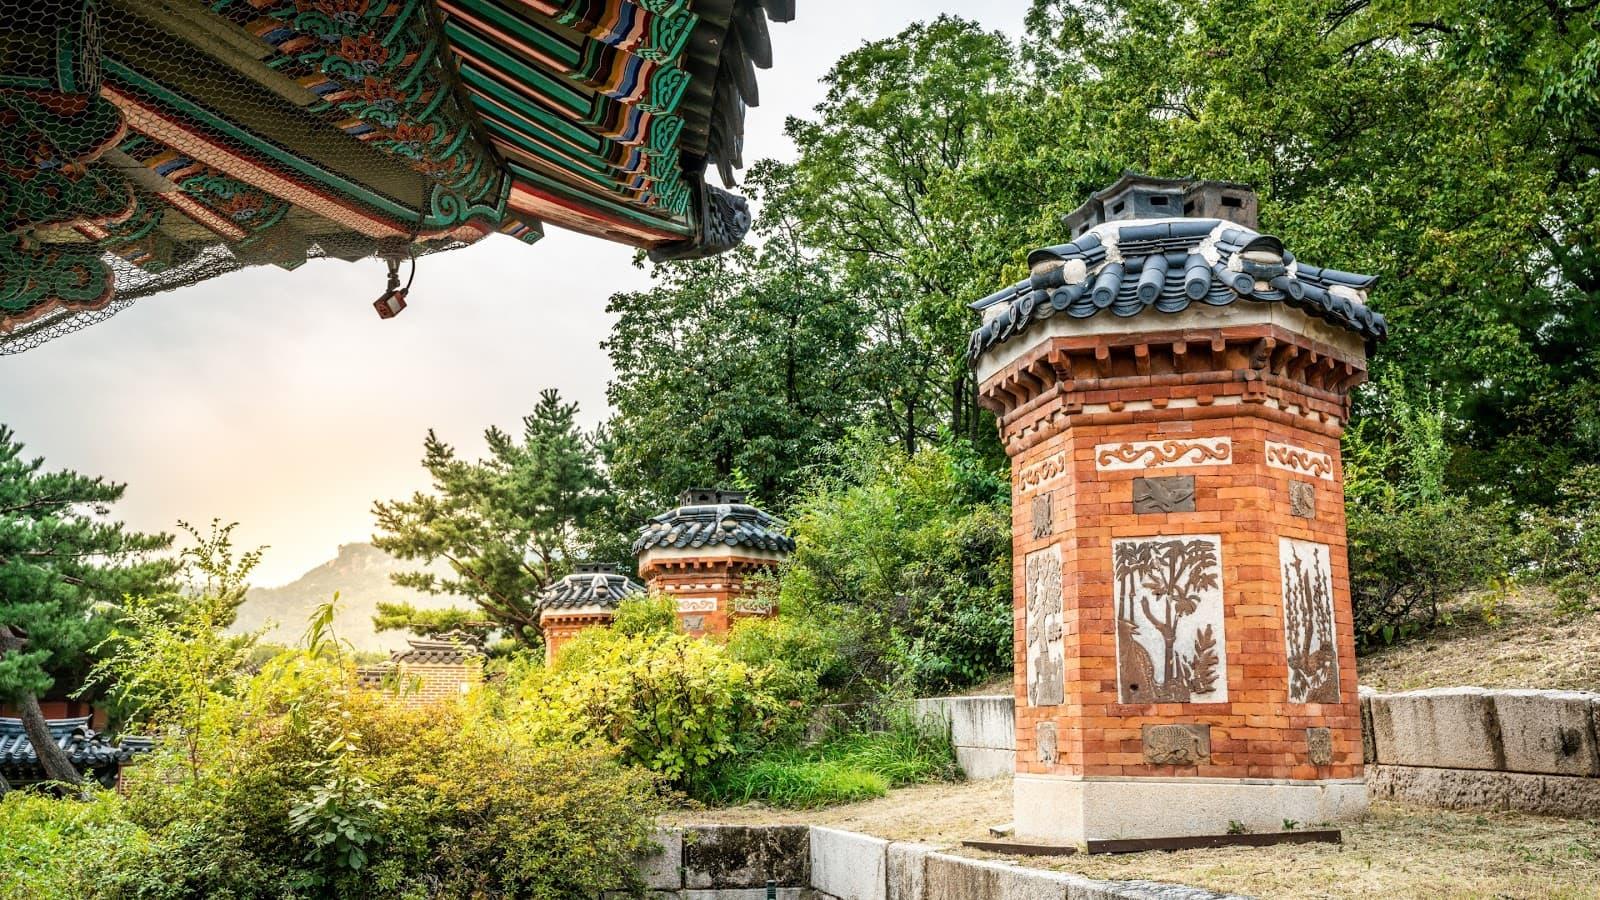 Olden day ondol heating furnace in Gyeongbokgung Palace